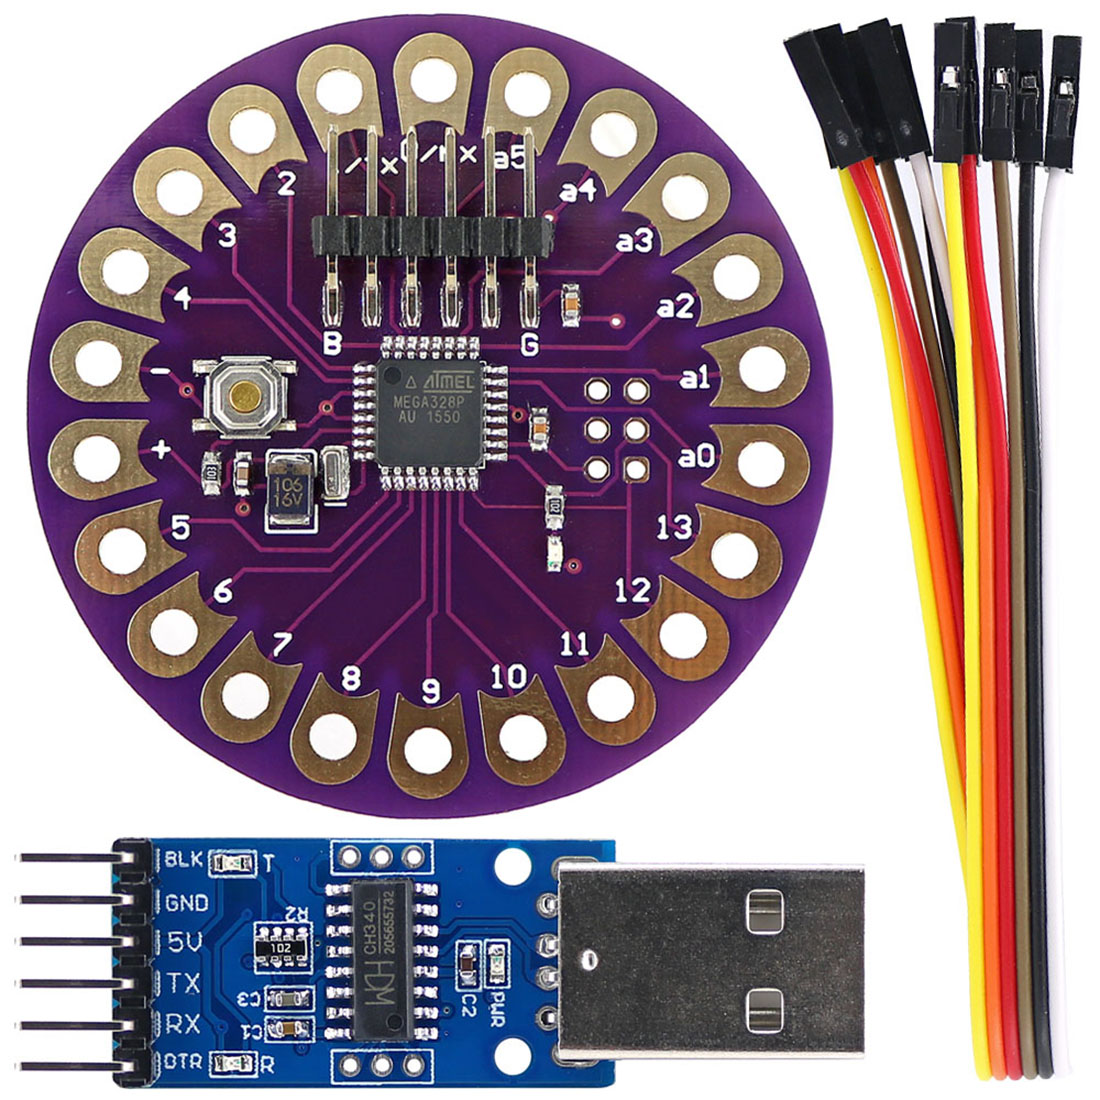 Lilypad ATmega328P Board Wearable Development Module + CH340G USB To TTL Programmer Module For Arduino